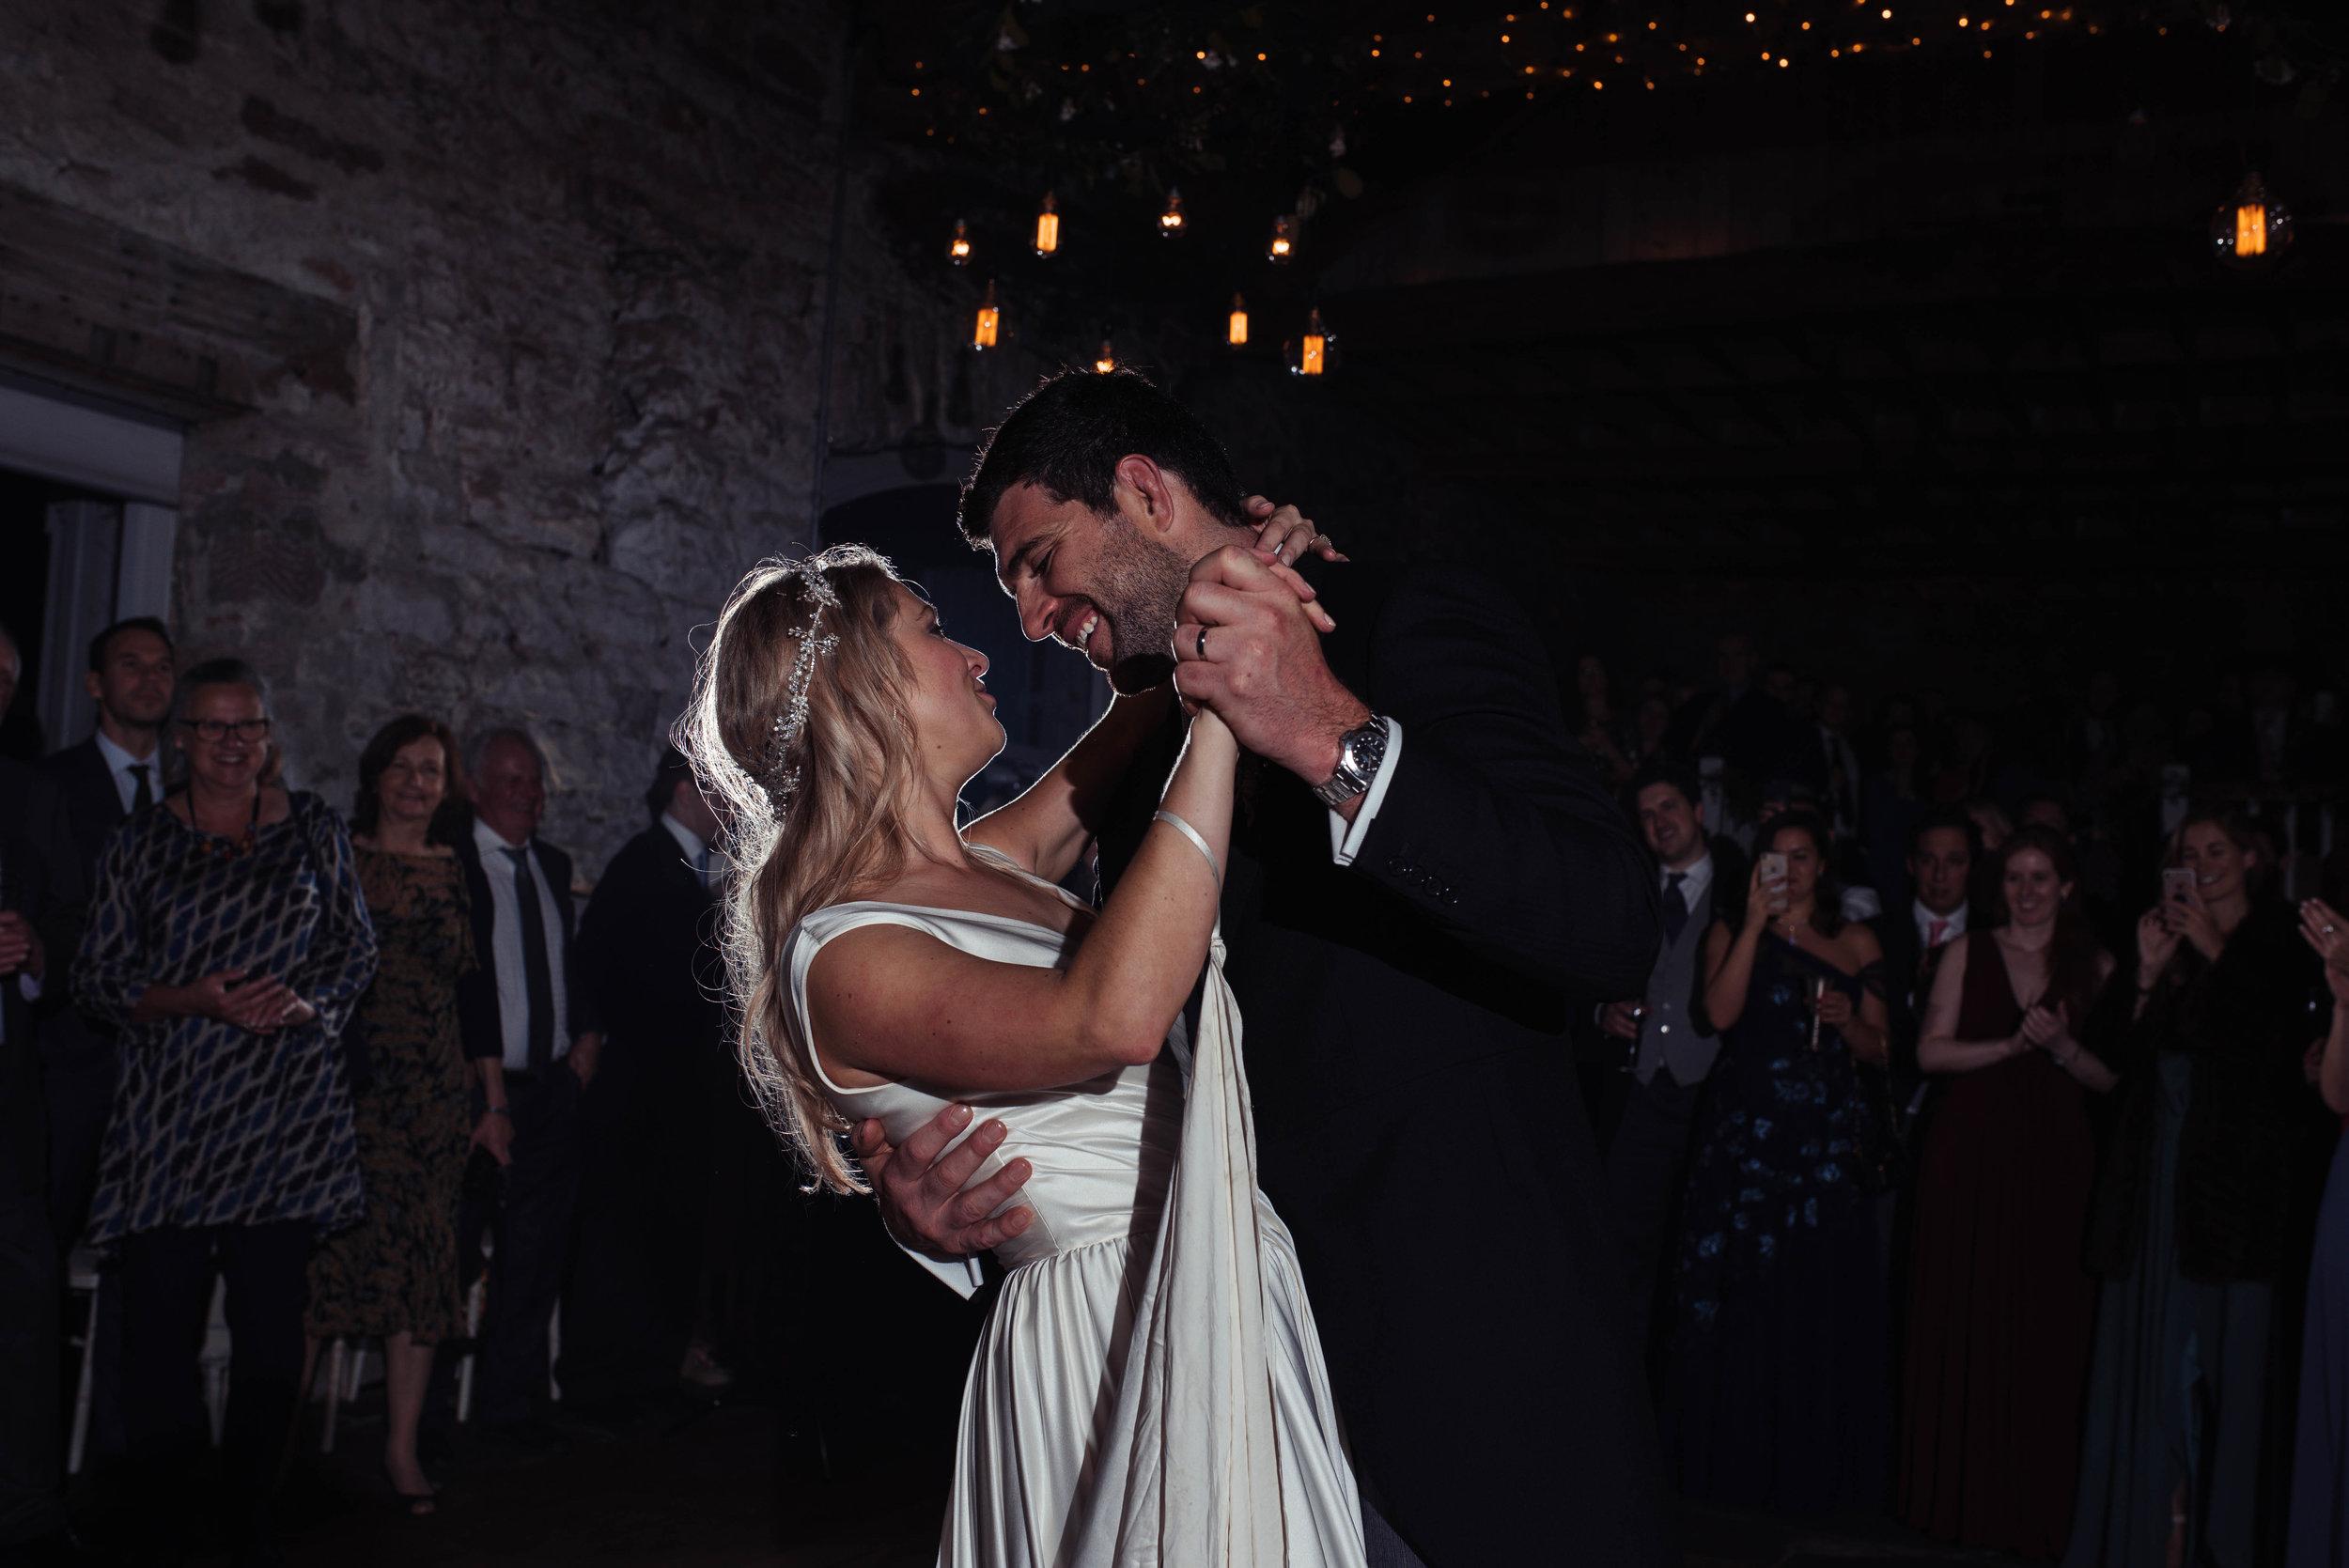 Askham-Hall-Wedding-Photography-85.jpg